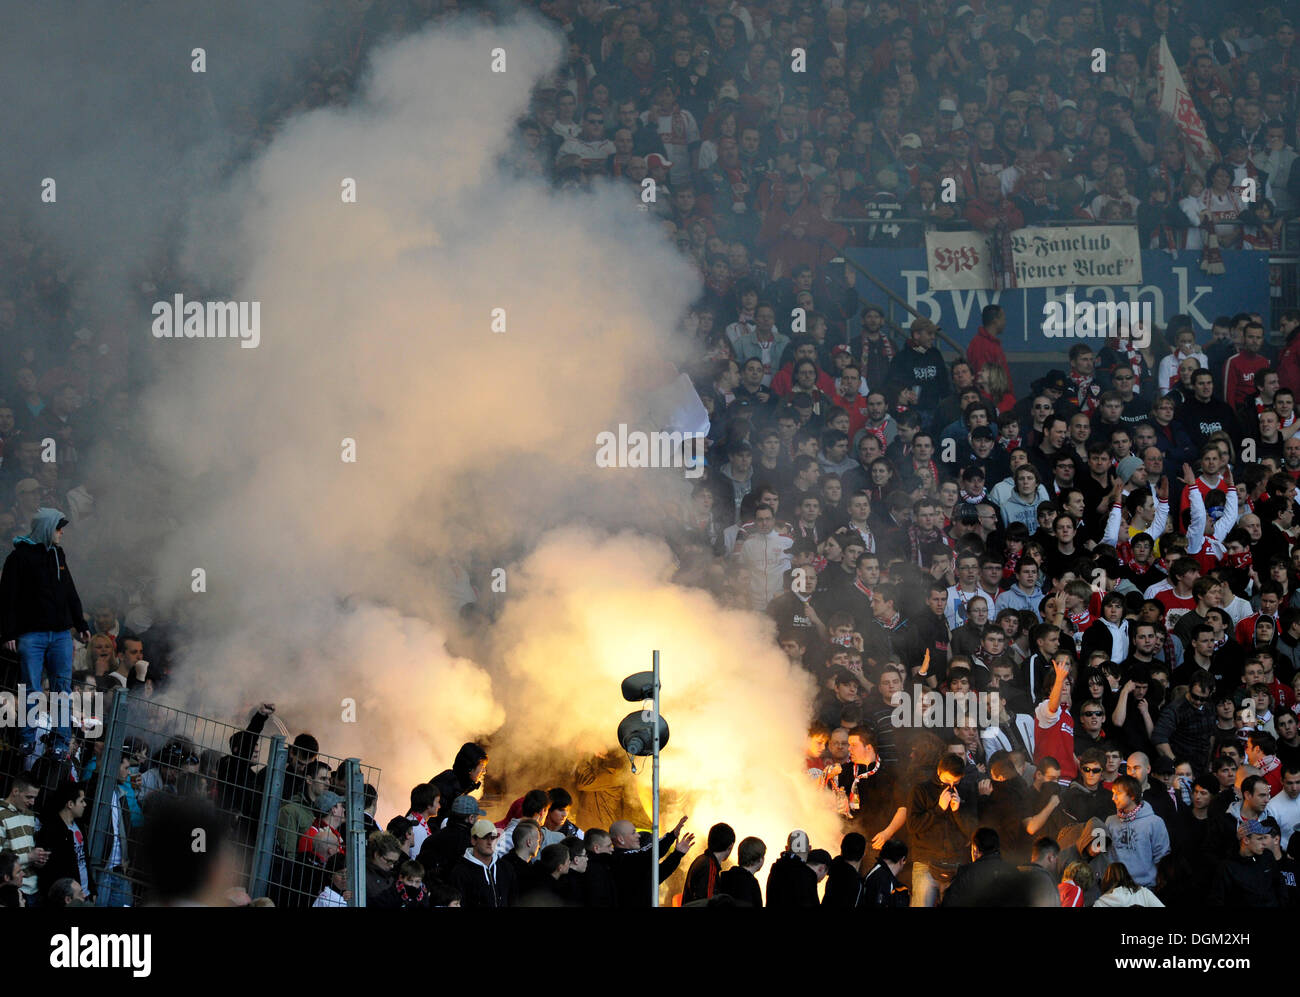 Vandalisers igniting fireworks, smoke bombs, flares, pyros, in the VfB Stuttgart fanblock, Mercedes-Benz Arena, Stuttgart - Stock Image